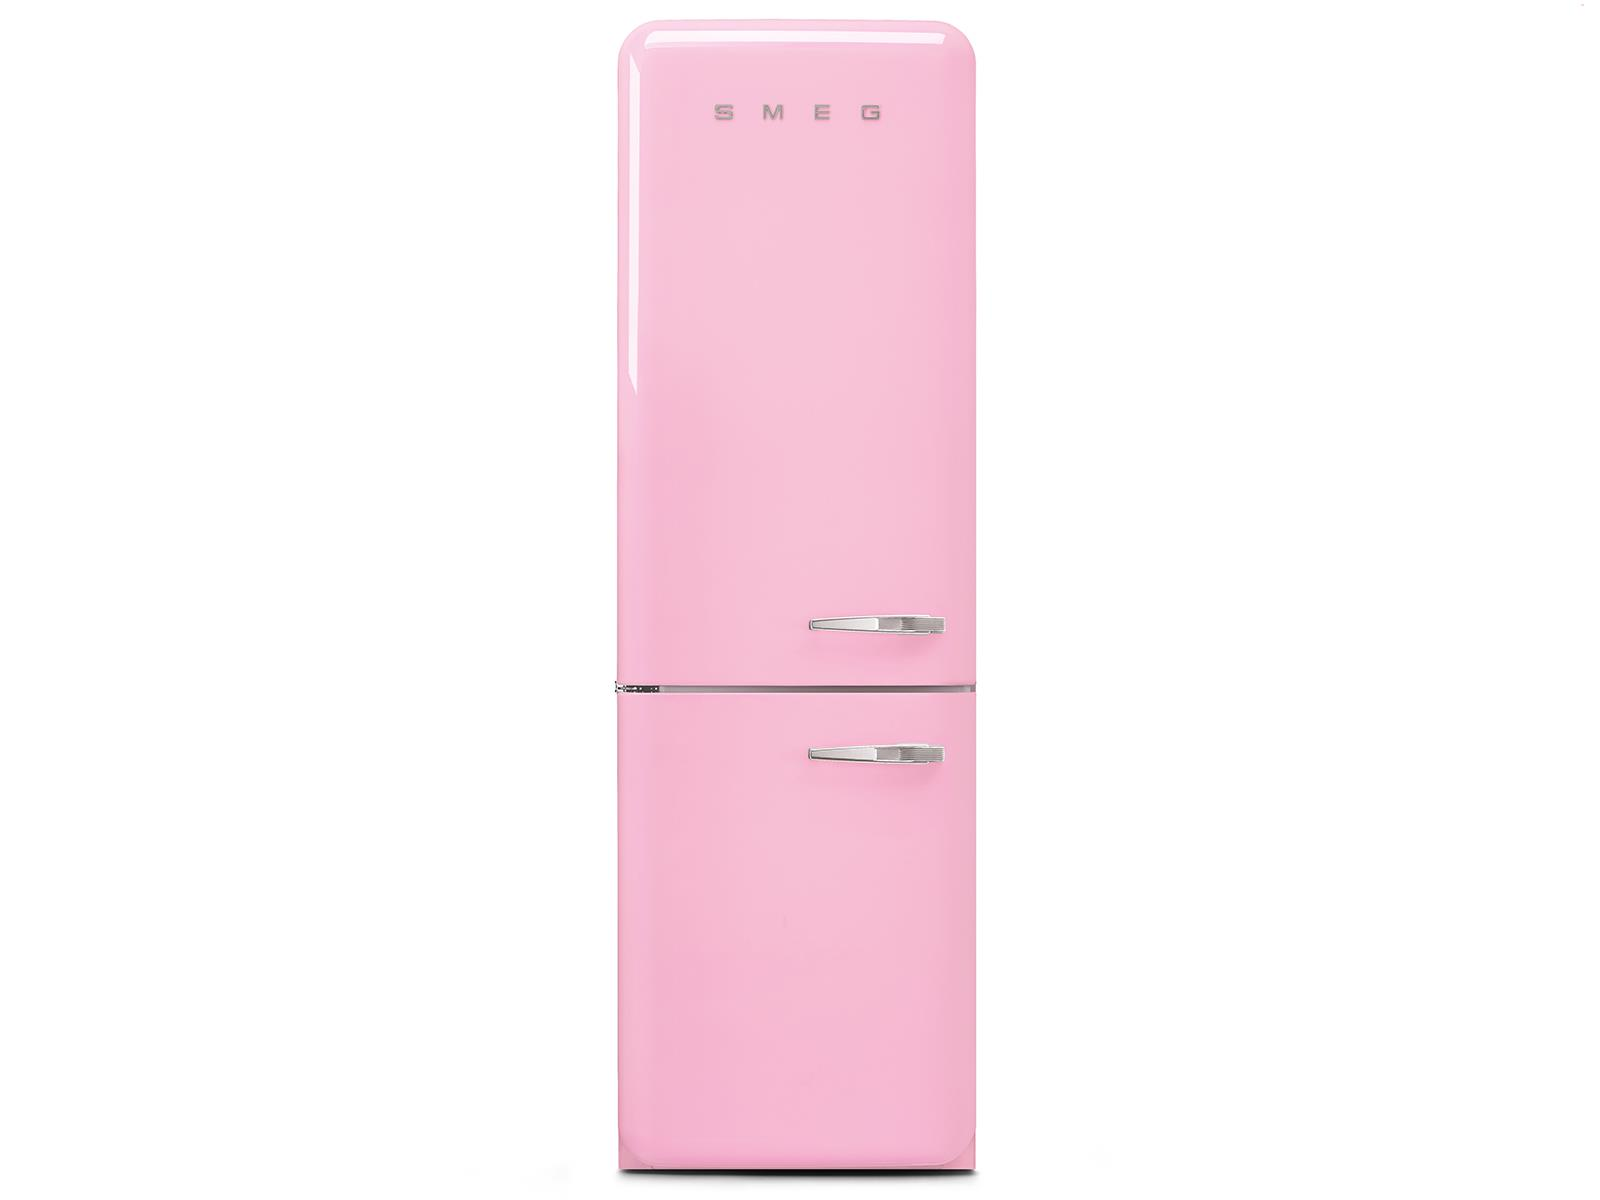 Smeg Kleiner Kühlschrank : Smeg kühlschrank bedienungsanleitung smeg kühlschrank innen smeg